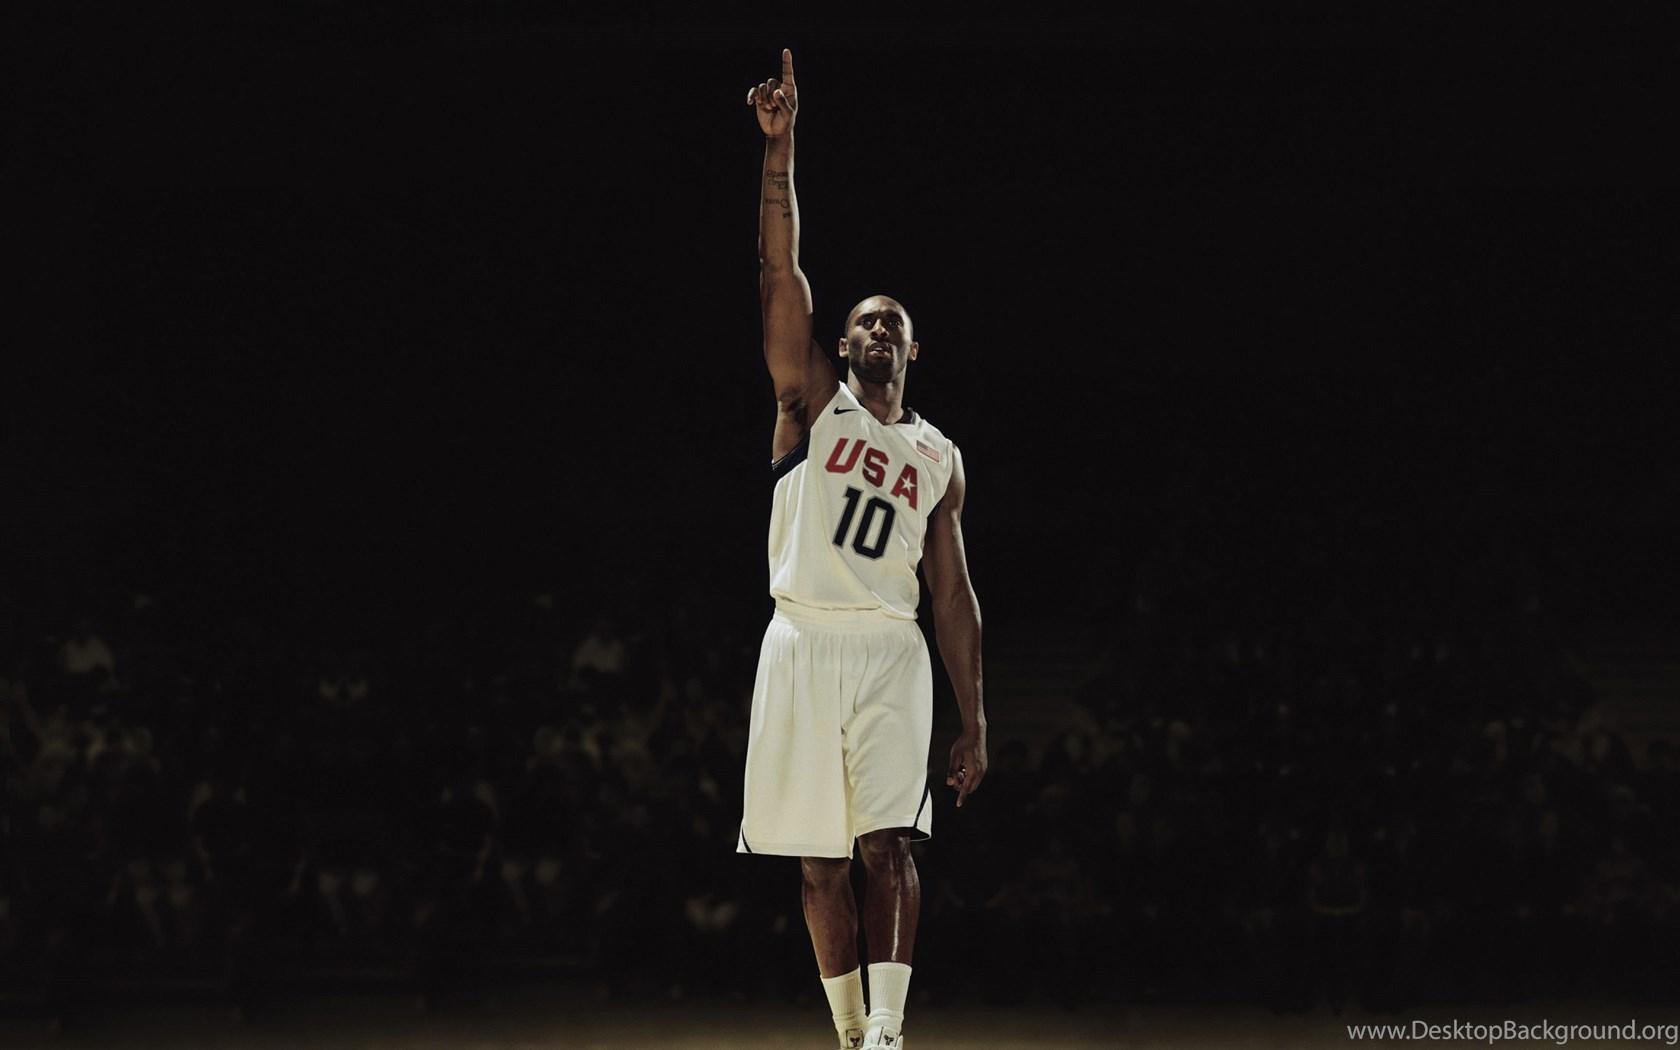 Kobe Bryant 4K Wallpapers - Top Free Kobe Bryant 4K